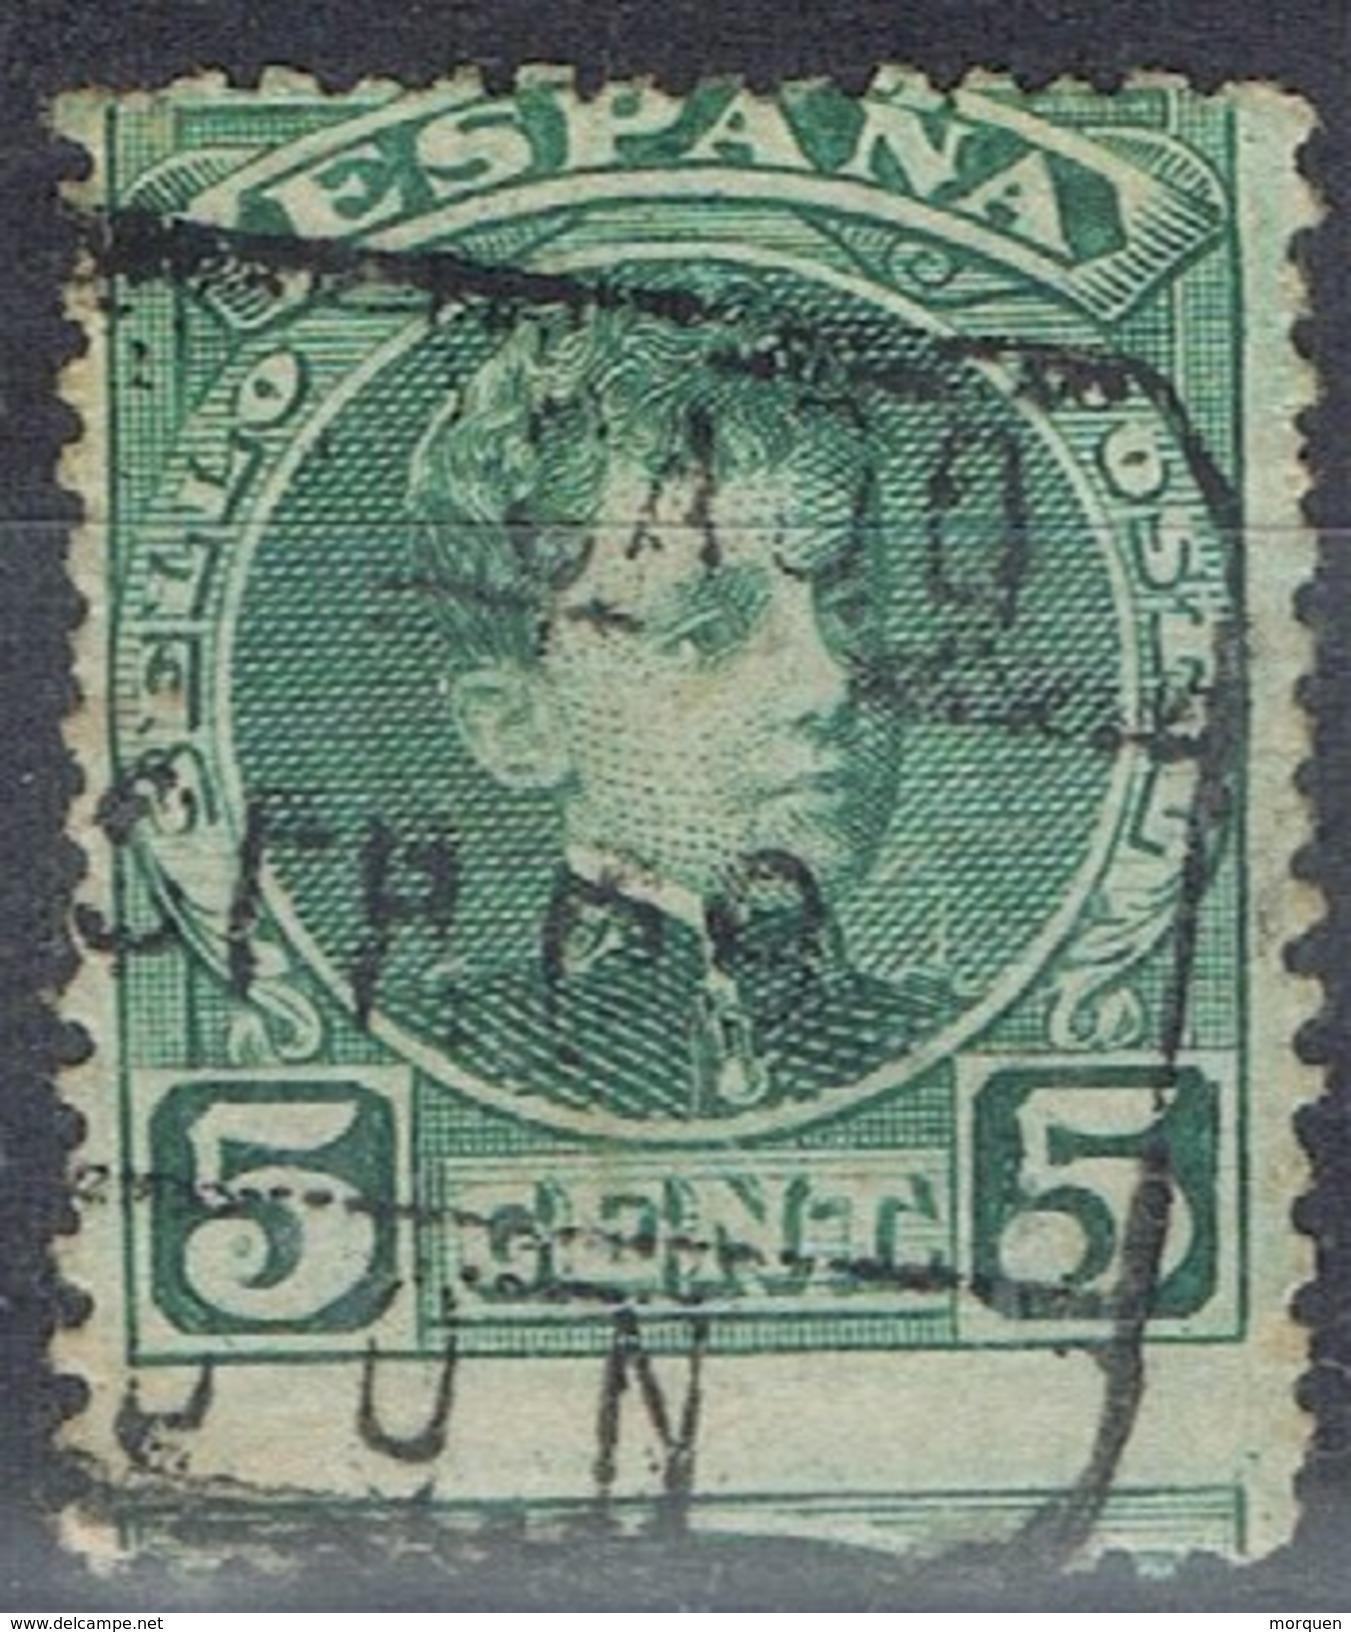 Sello 5 Cts Alfonso XIII Cadete, Variedad Salto De Peine, Descentrado, Fechador Certificado GIJON (Asturia), Num 242 º - 1889-1931 Reino: Alfonso XIII